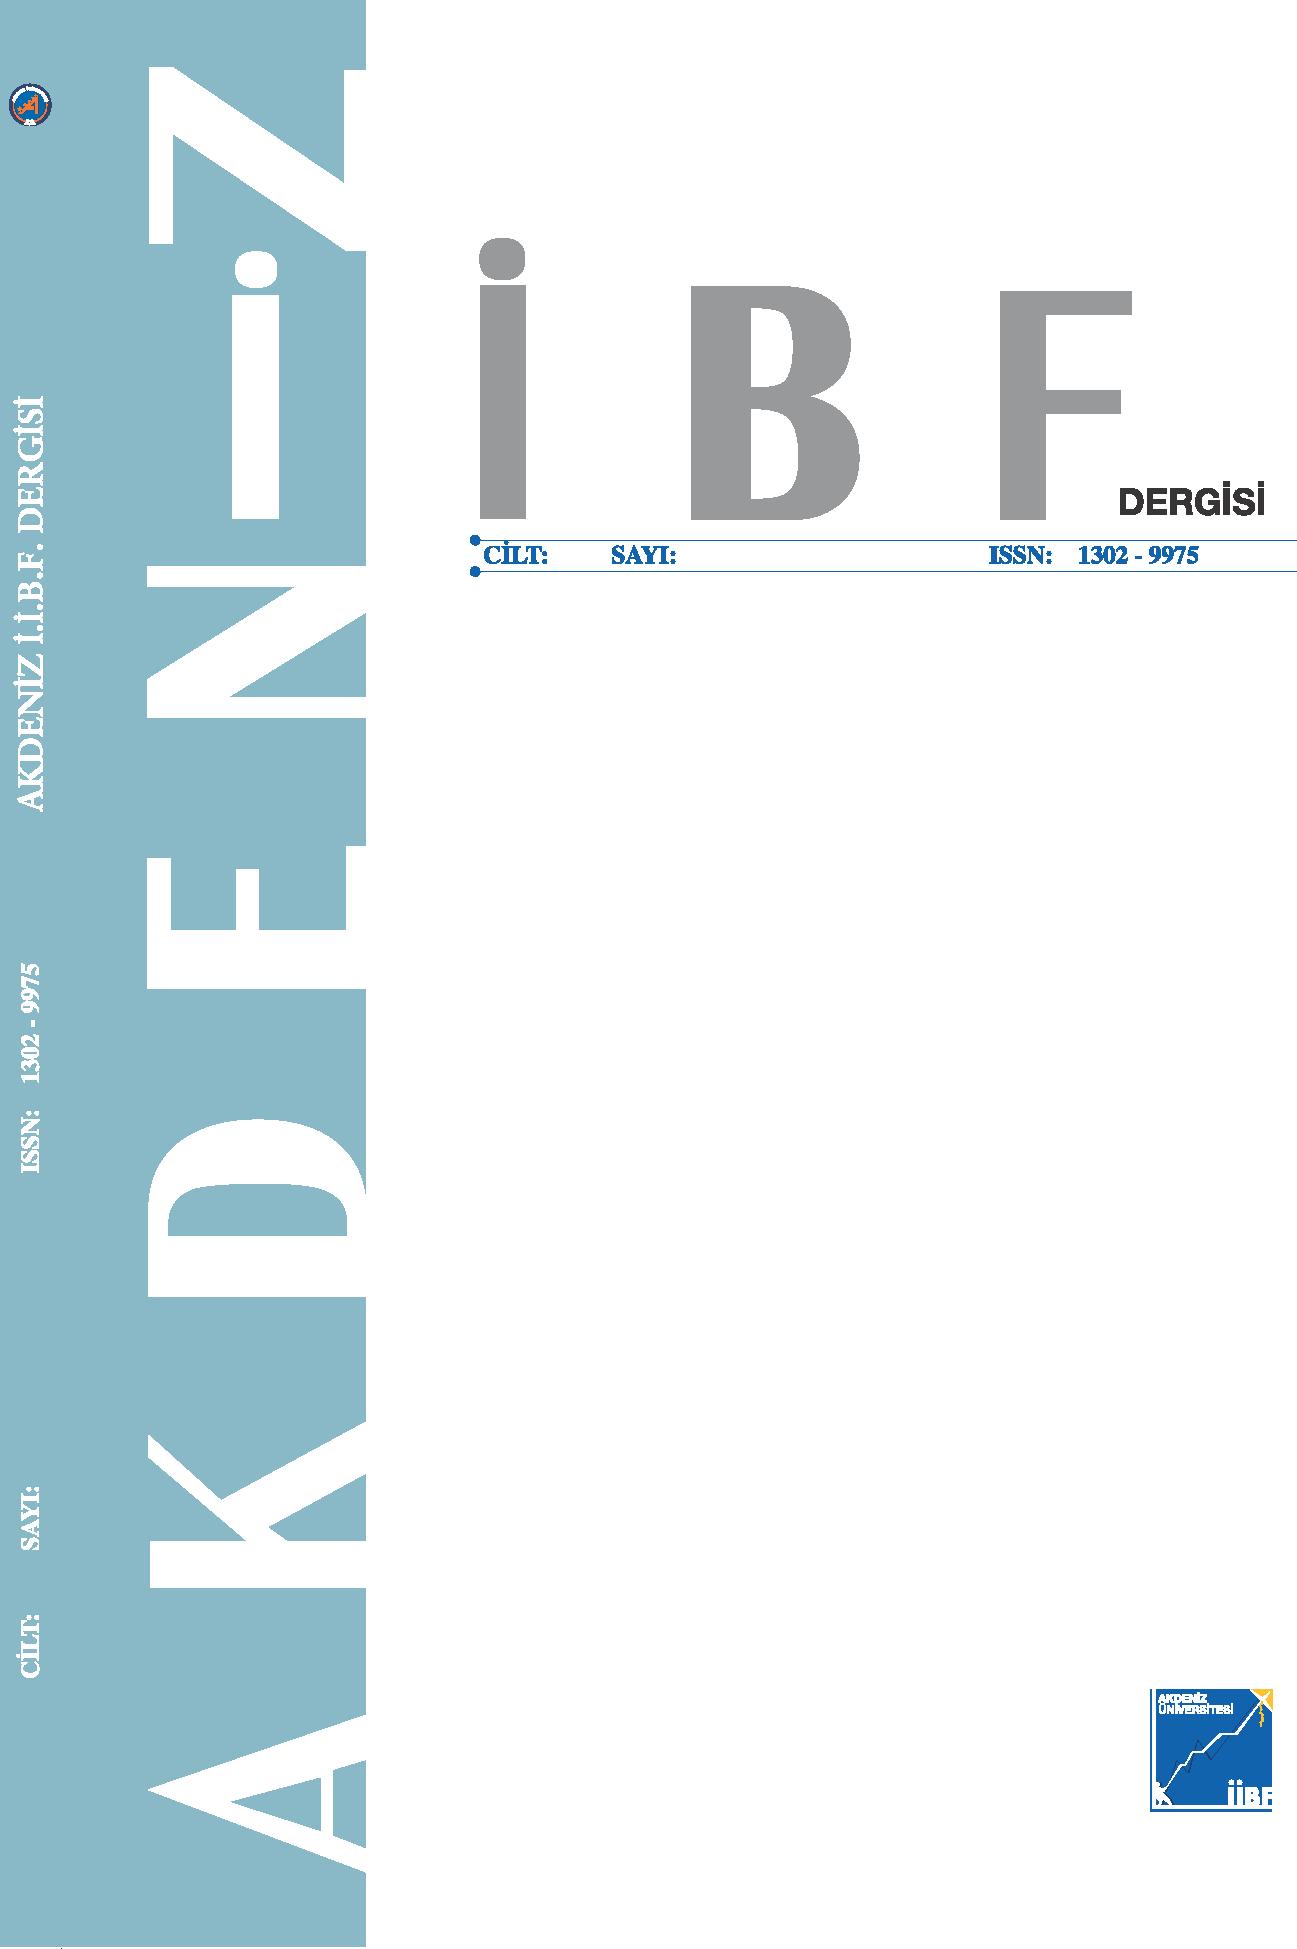 Akdeniz İİBF journal